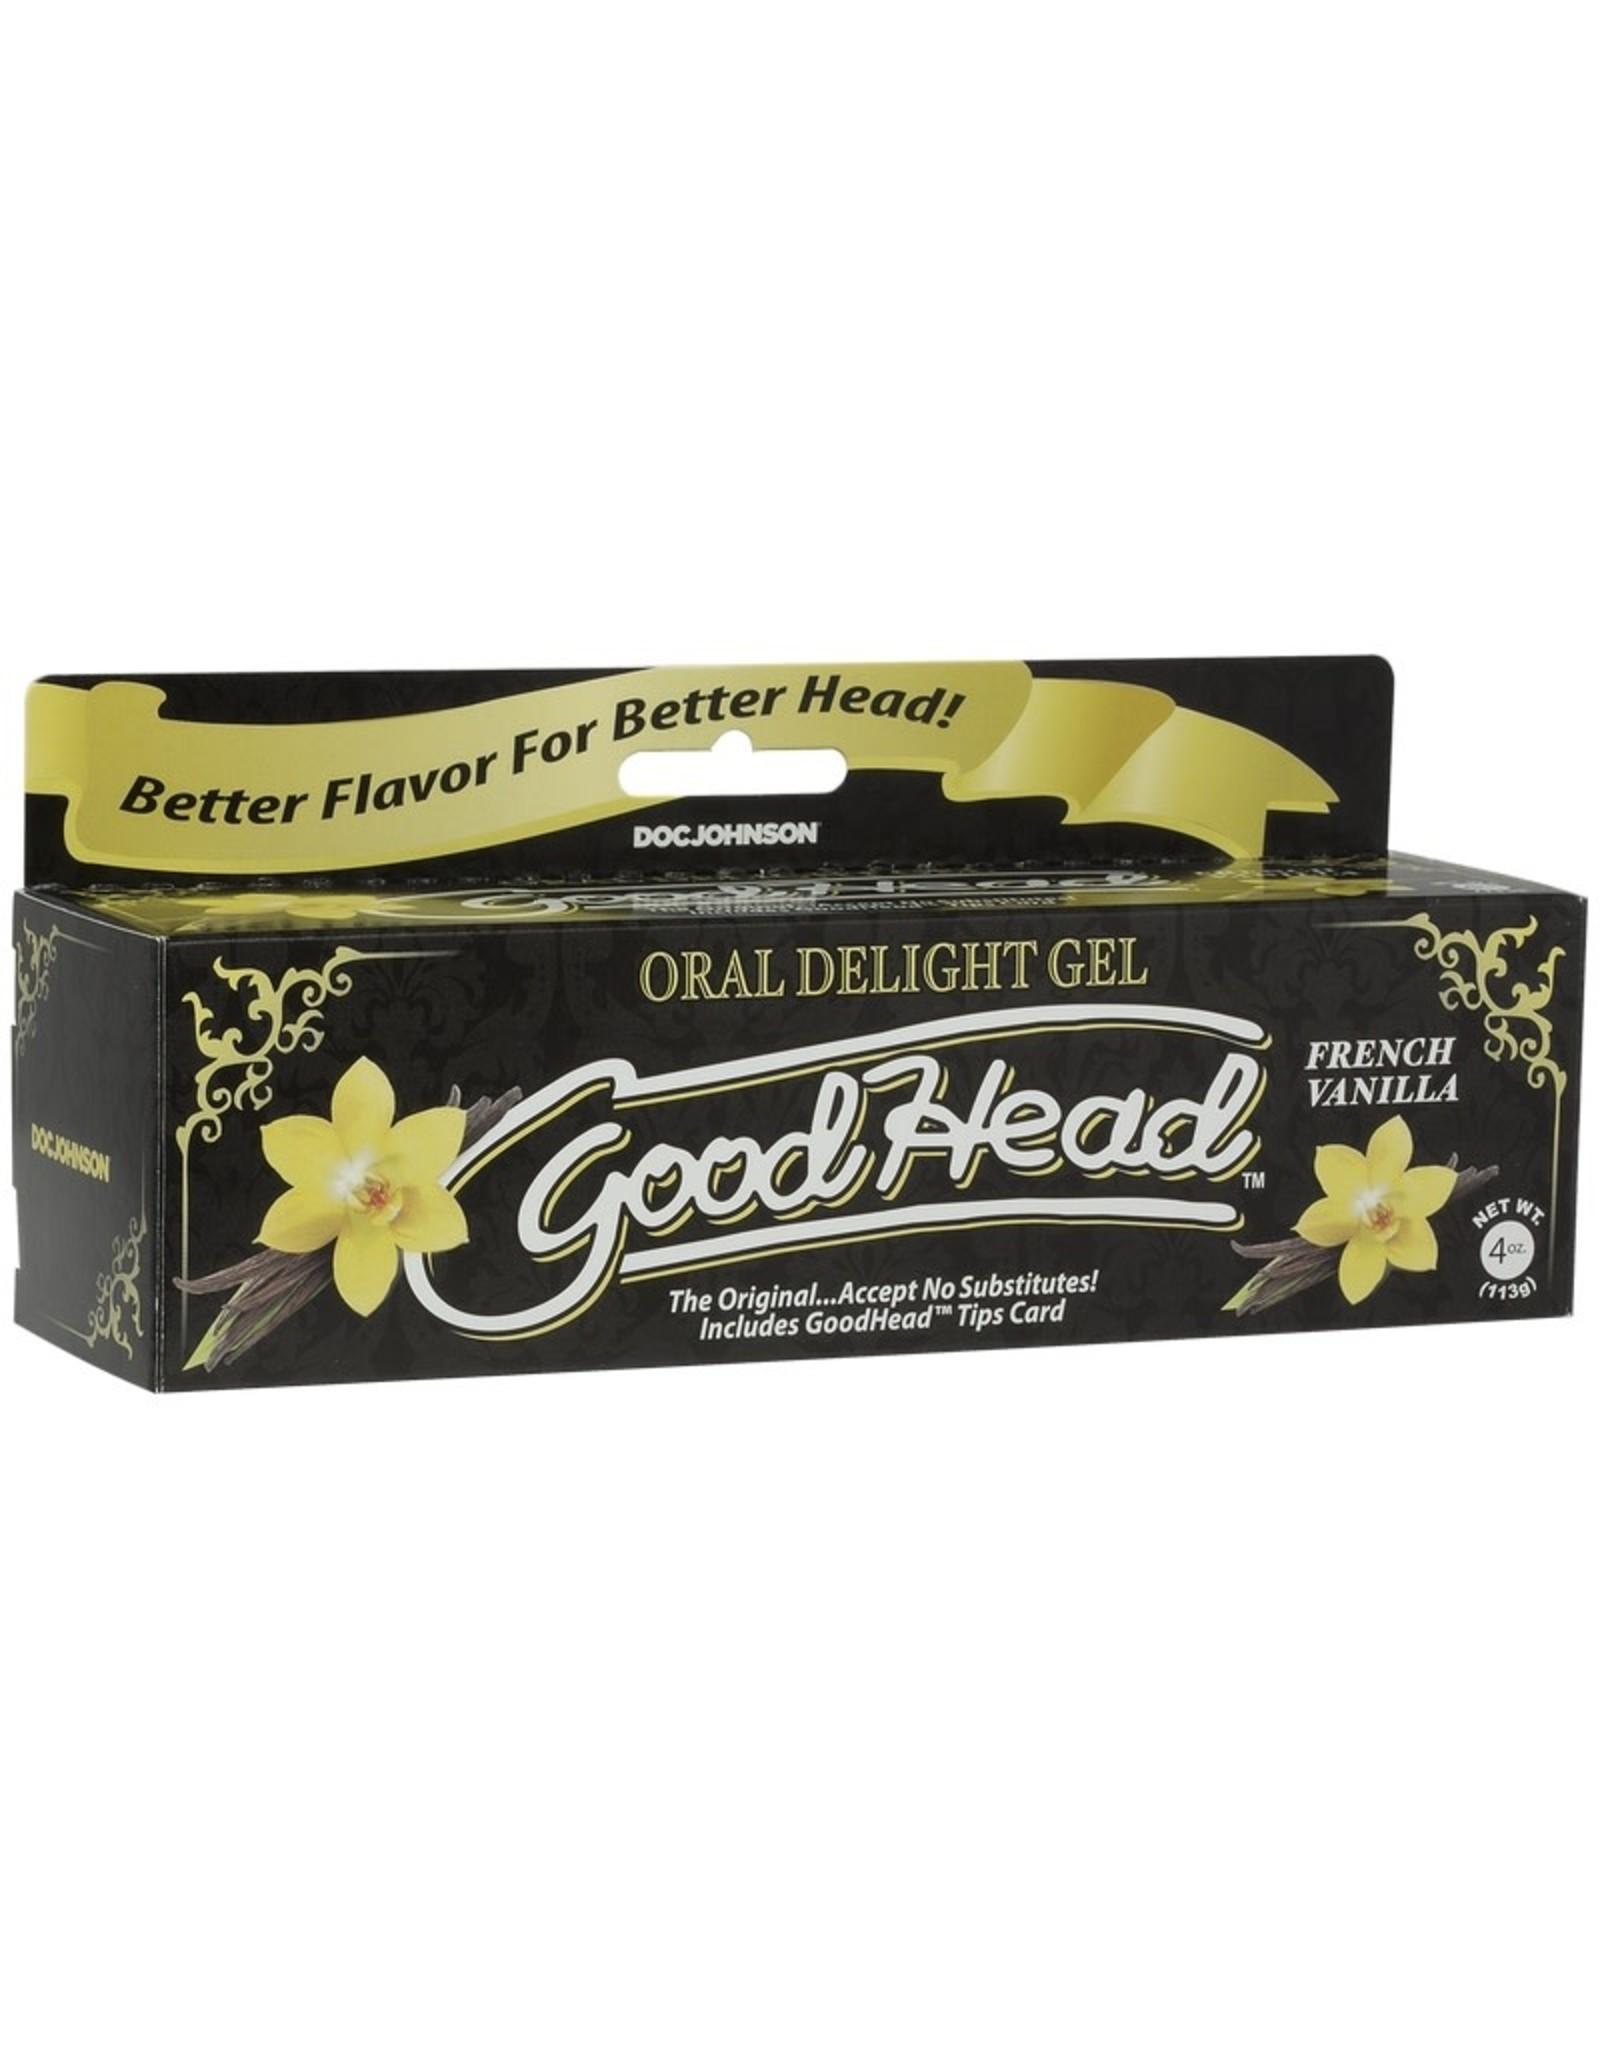 Doc Johnson Good Head Oral Delight Gel - French Vanilla (4 oz)